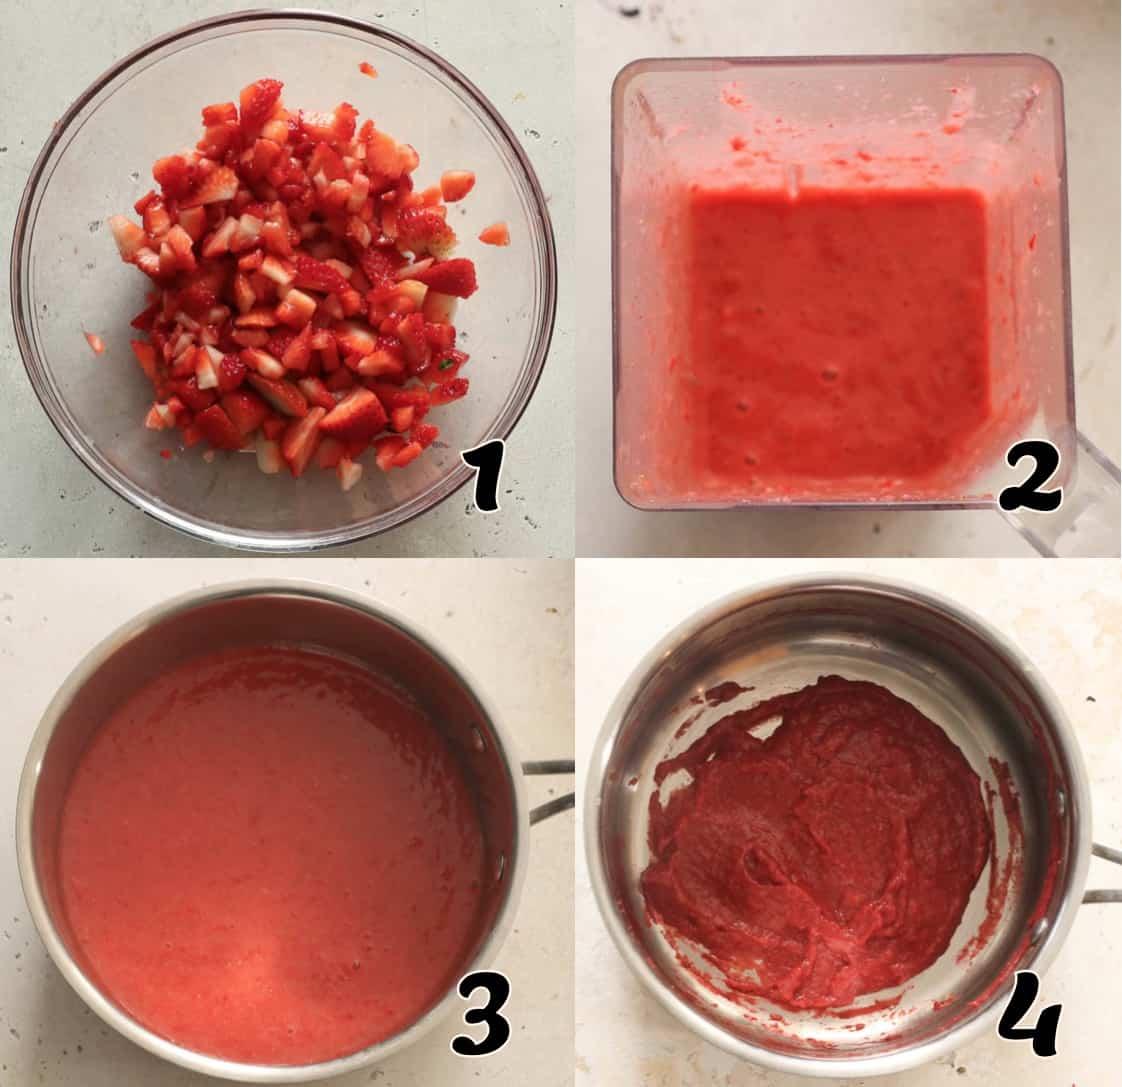 Making the Strawberry Puree